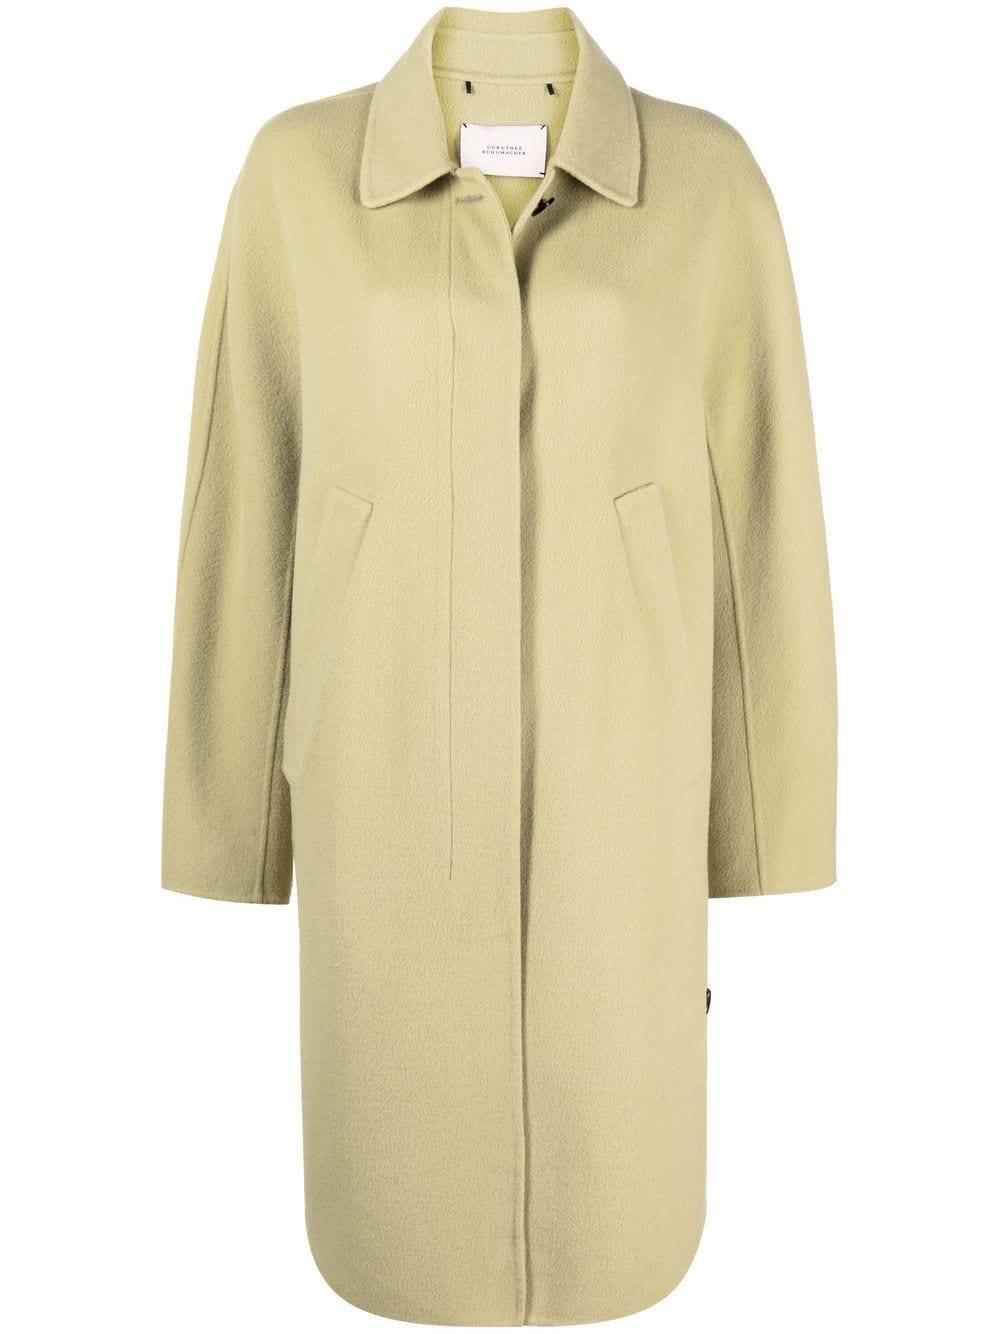 Slouchy Ease Coat Item # 213-448301